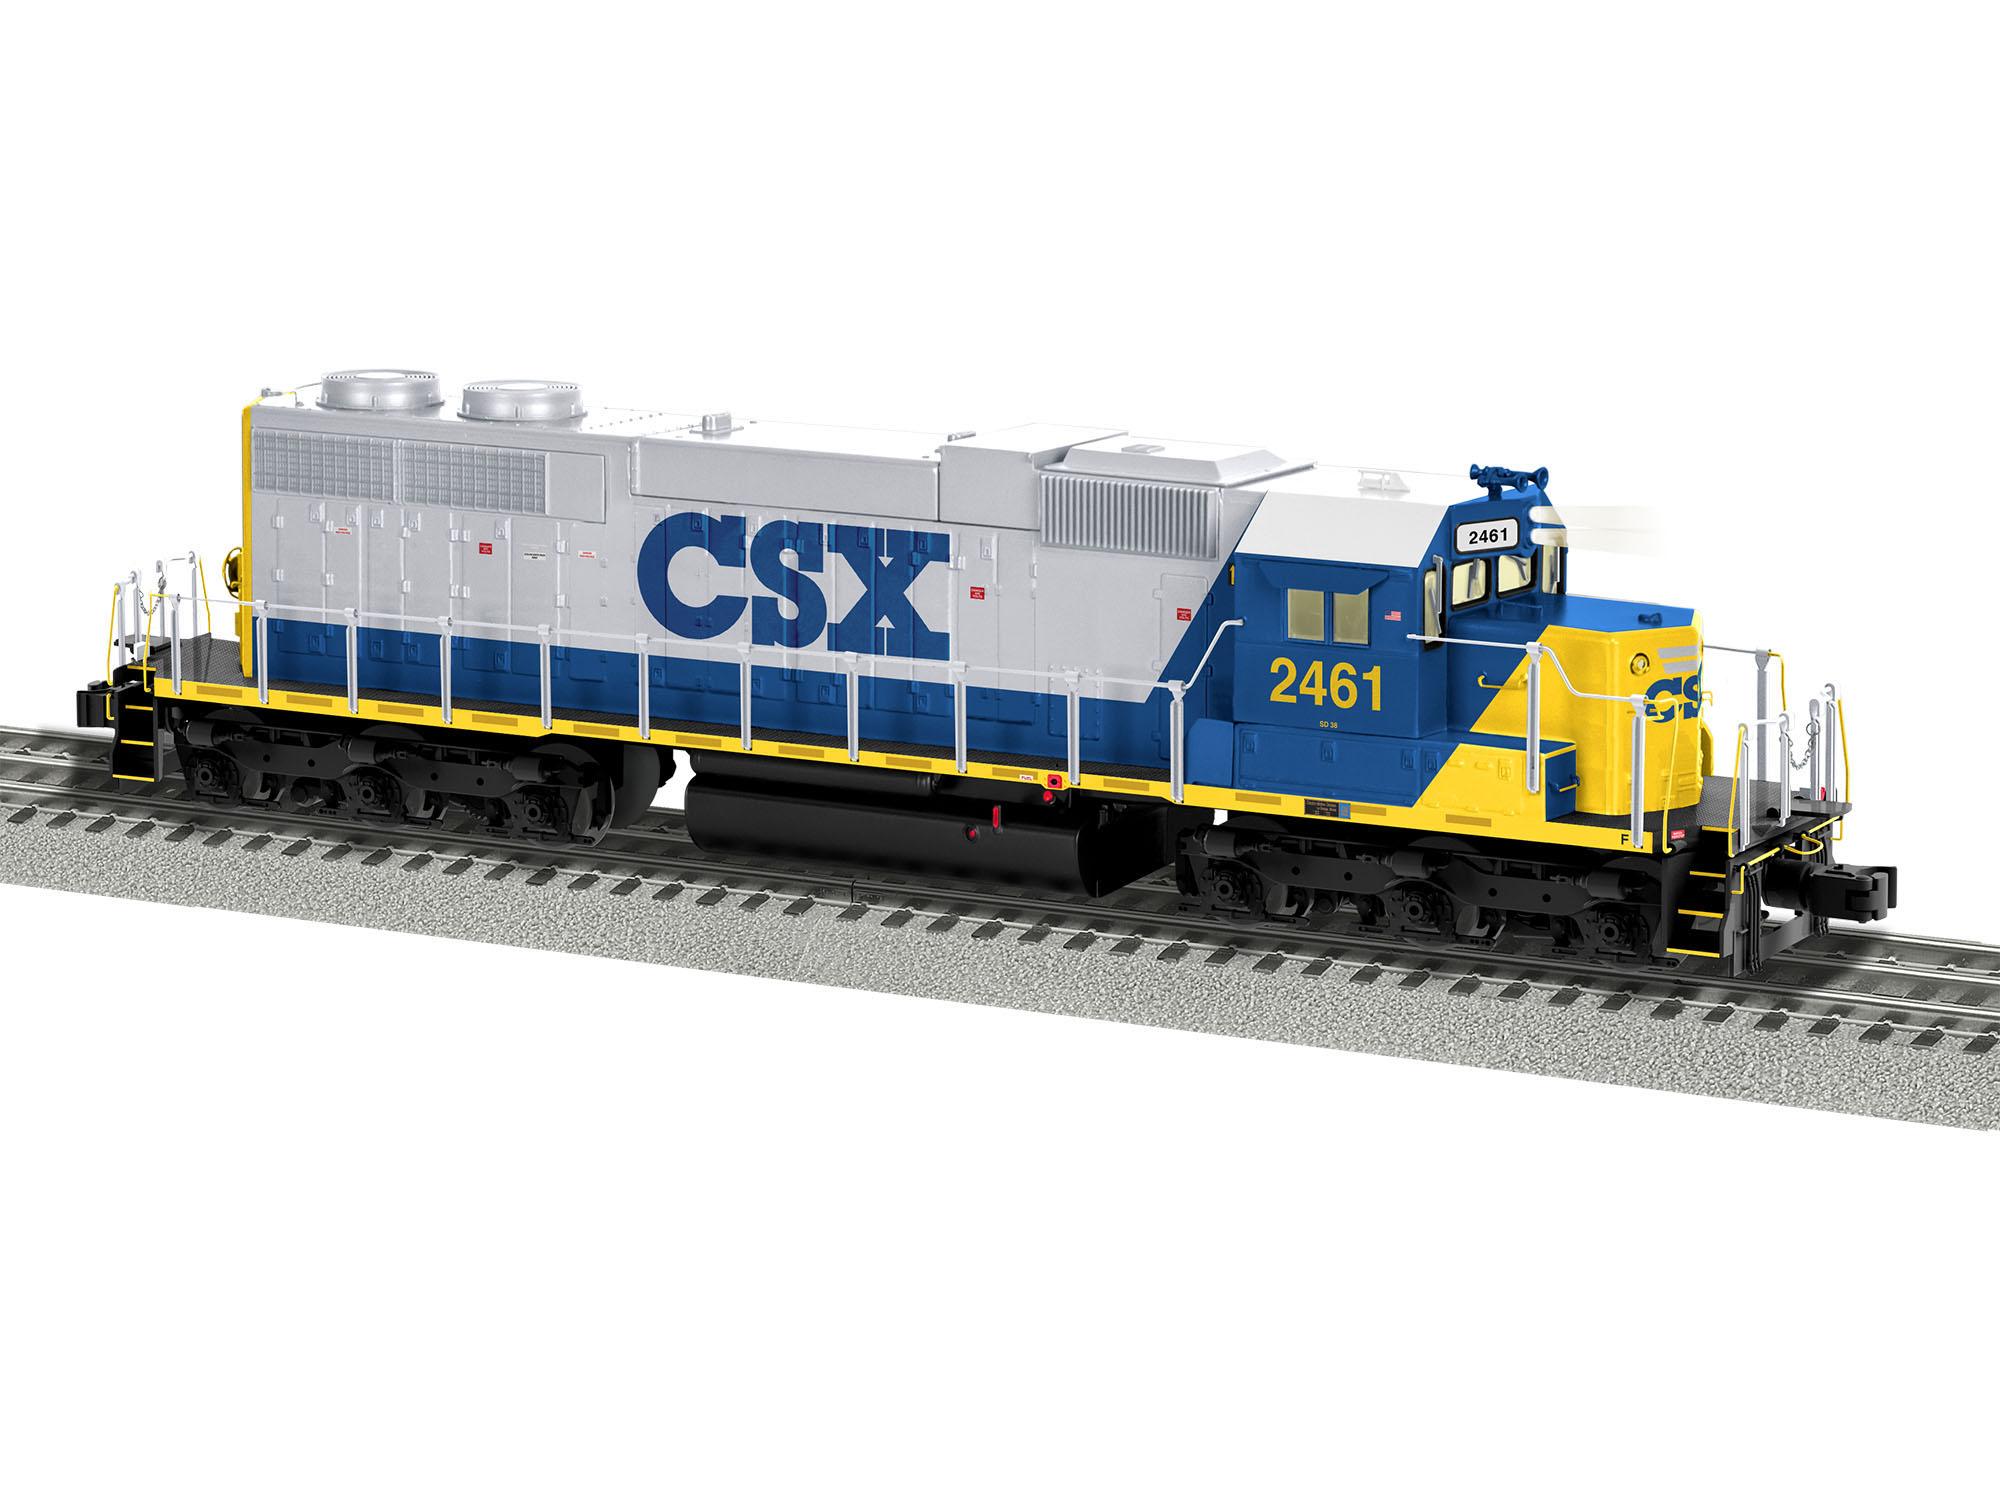 Lionel 2033031 O EMD SD38 3-Rail Legacy Sound and Control CSX 2461 434-2033031